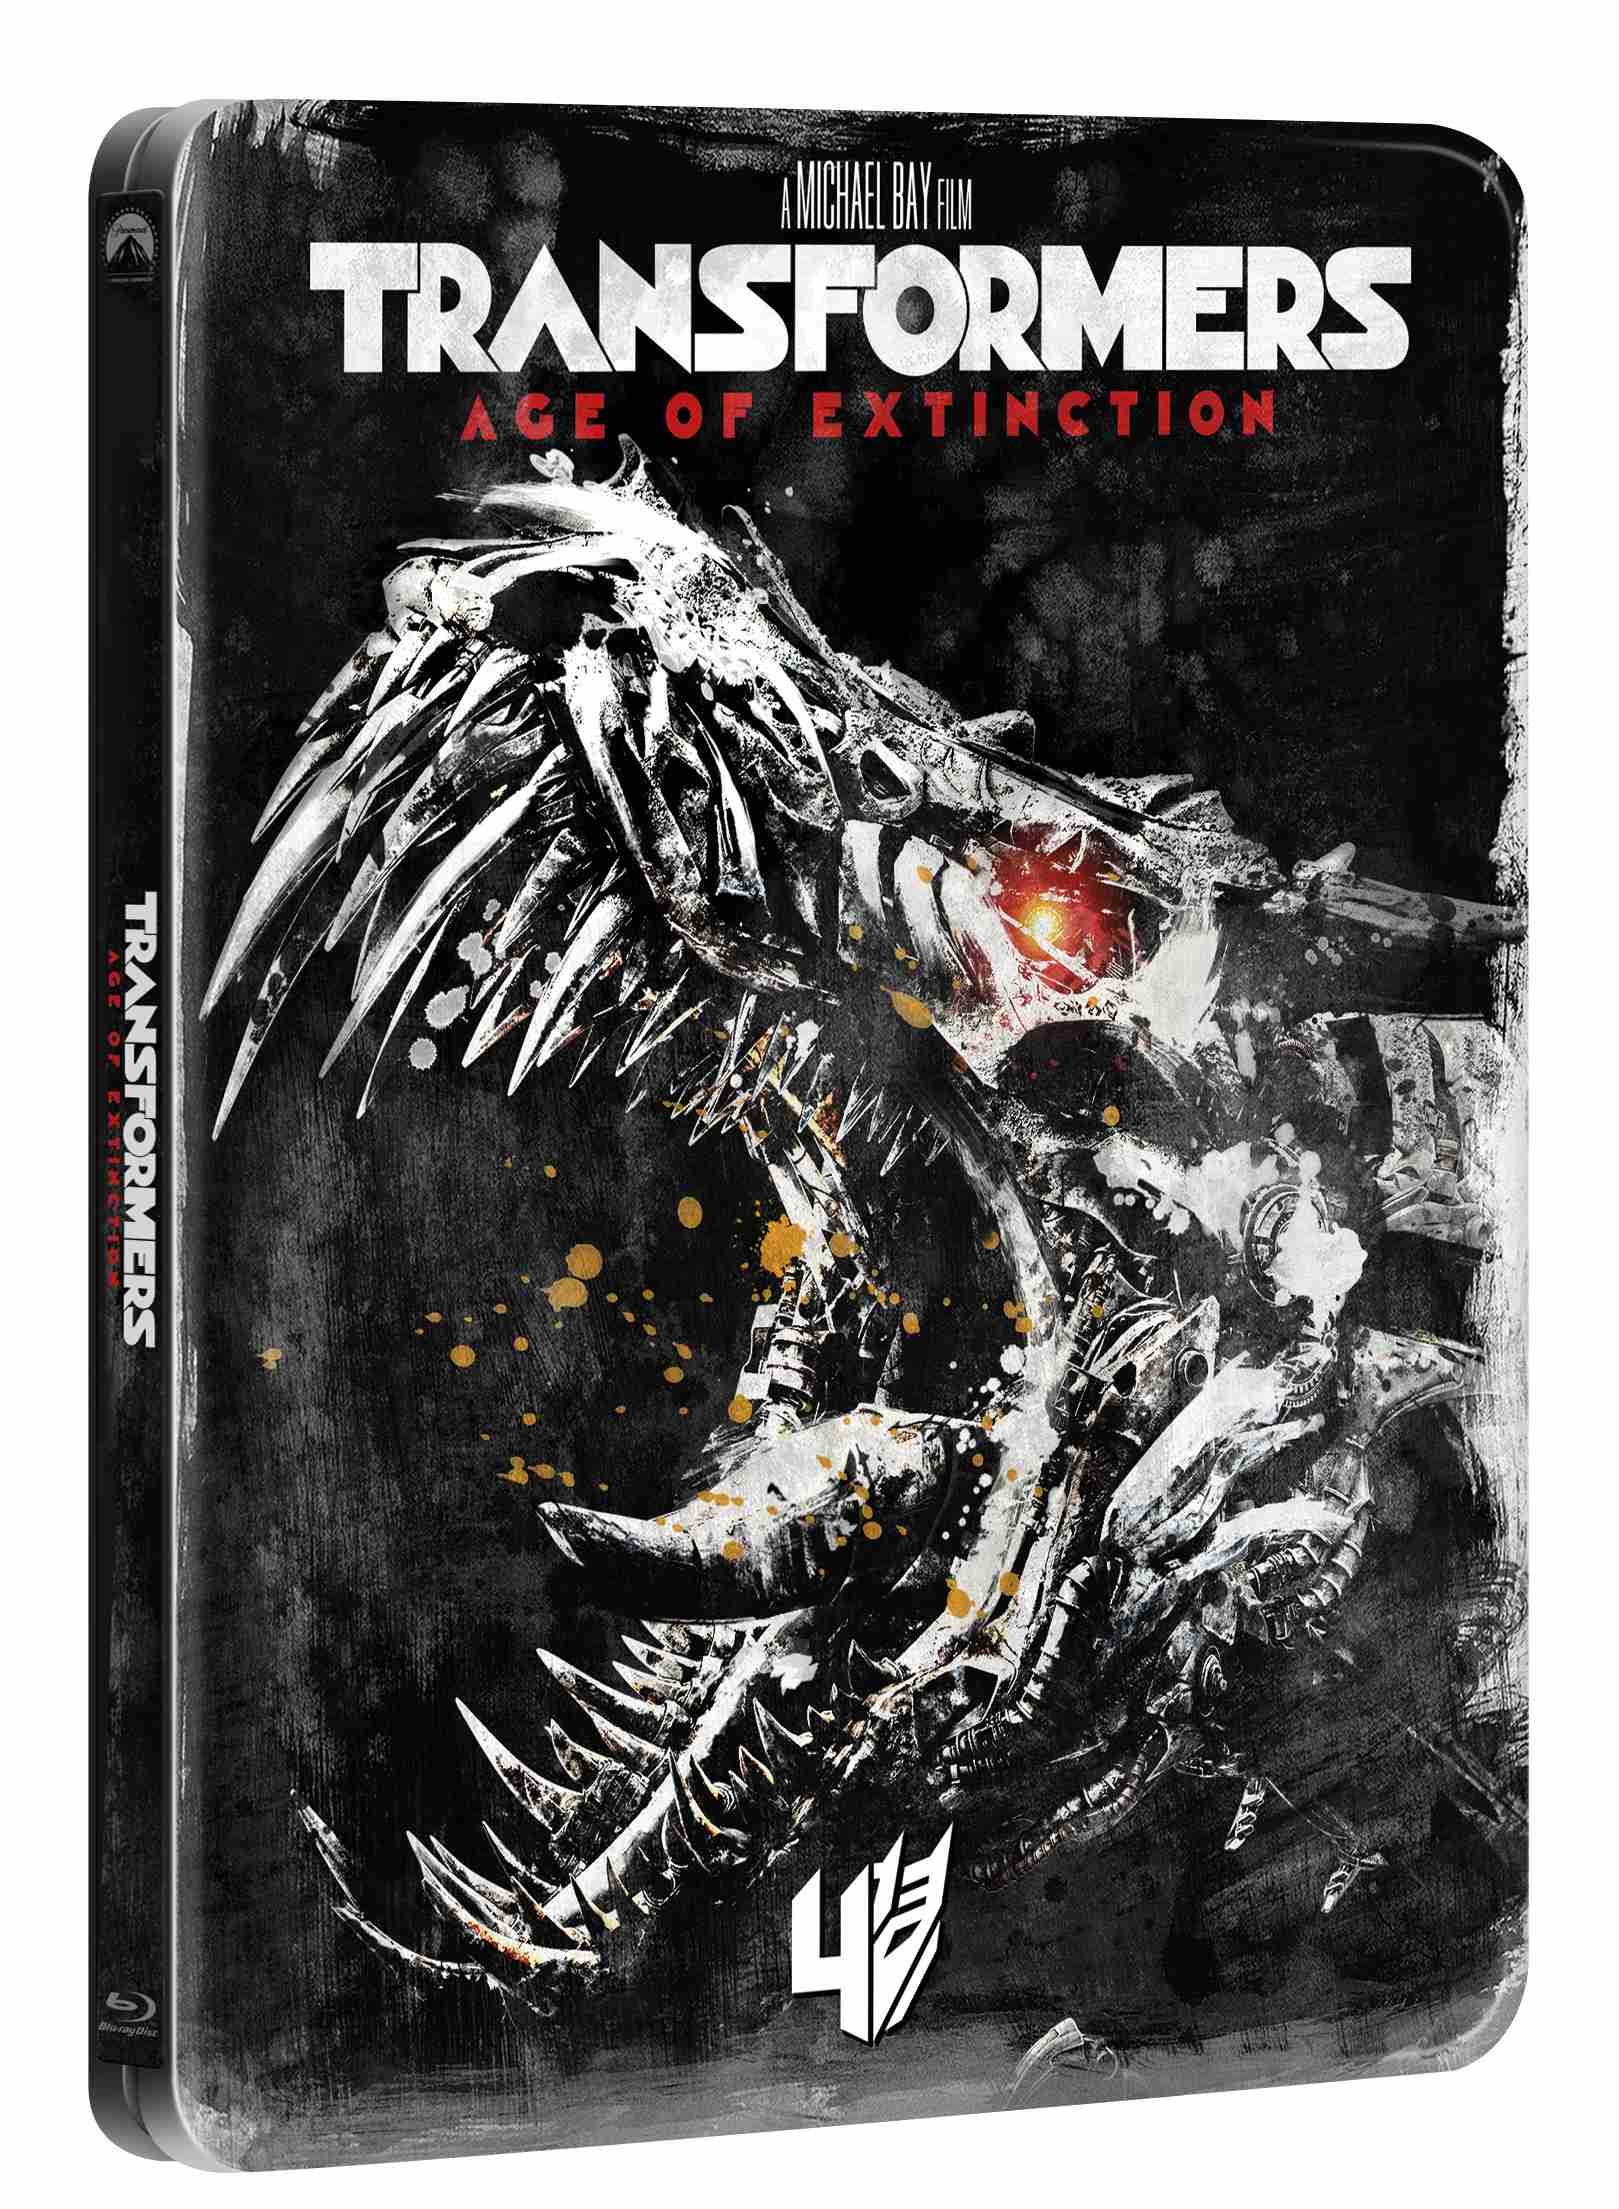 TRANSFORMERS: ZÁNIK (Edice 10 let) - Blu-ray STEELBOOK